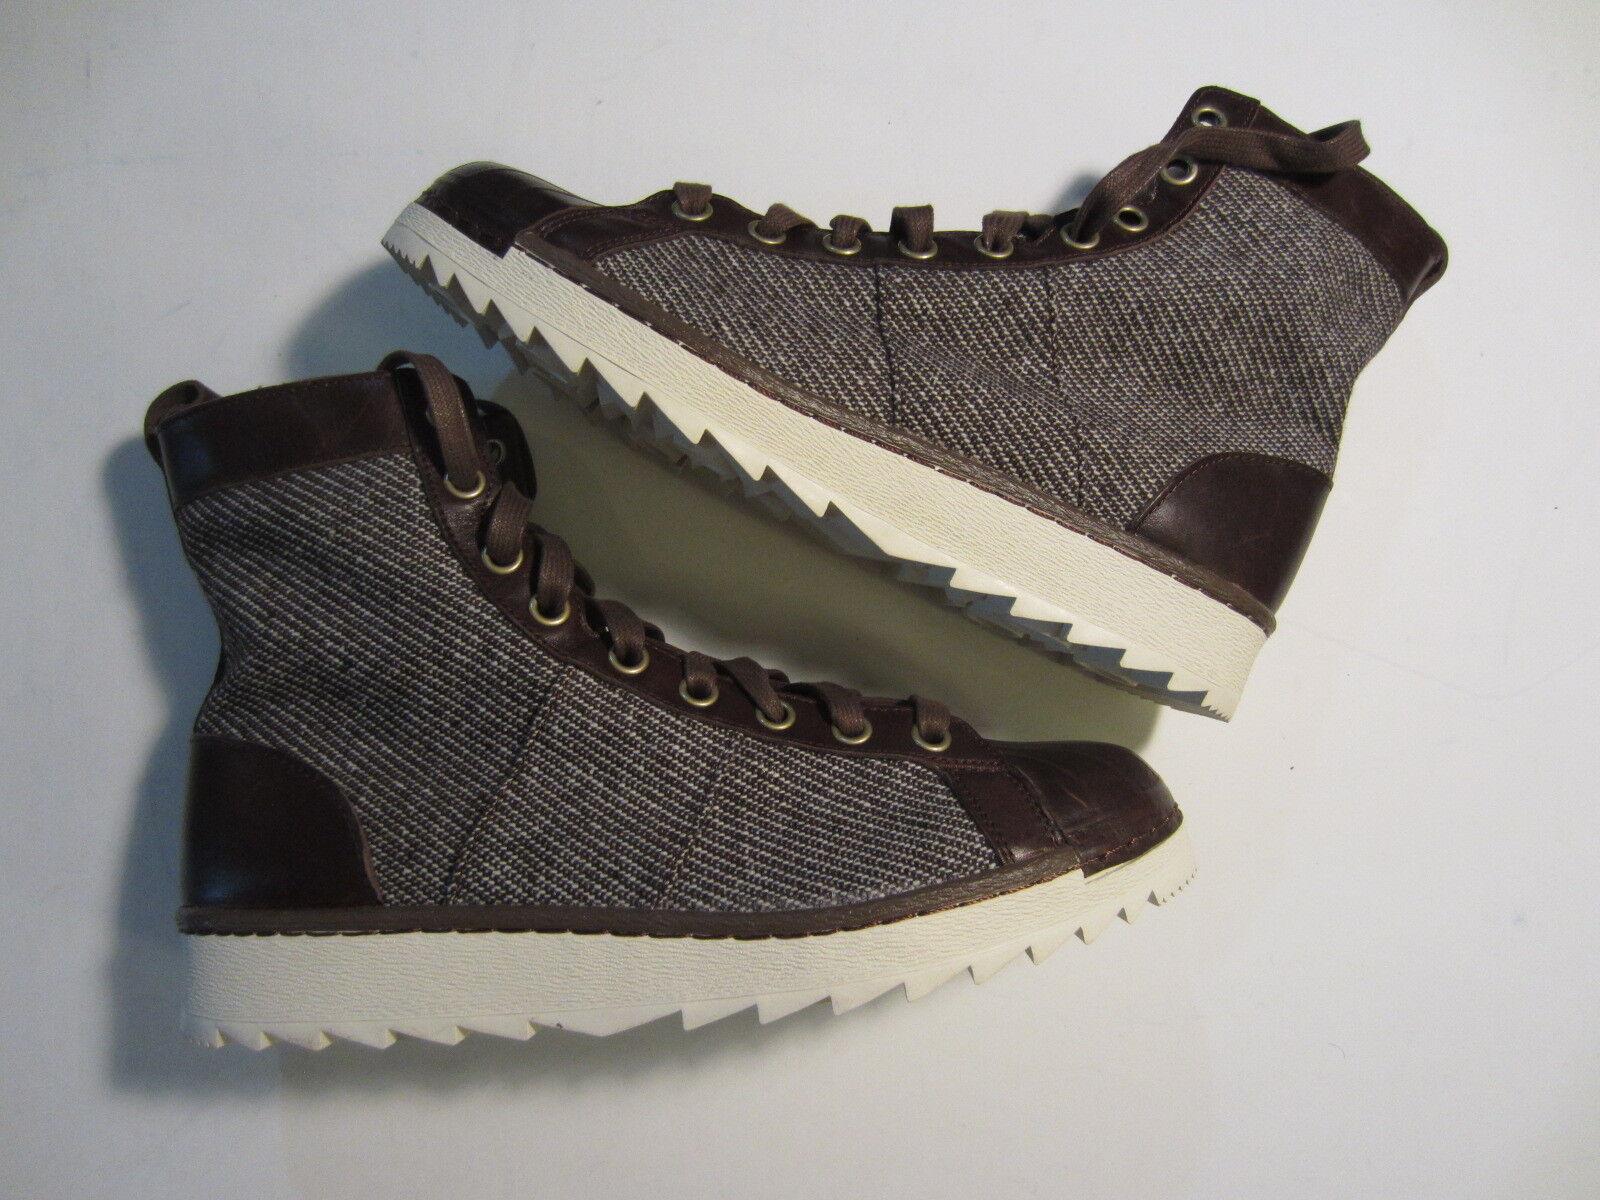 NEW Adidas Superstar Jungle Originals B35228 mens high boot shoe B35228 Originals Braun 7 - 13 58ce0d